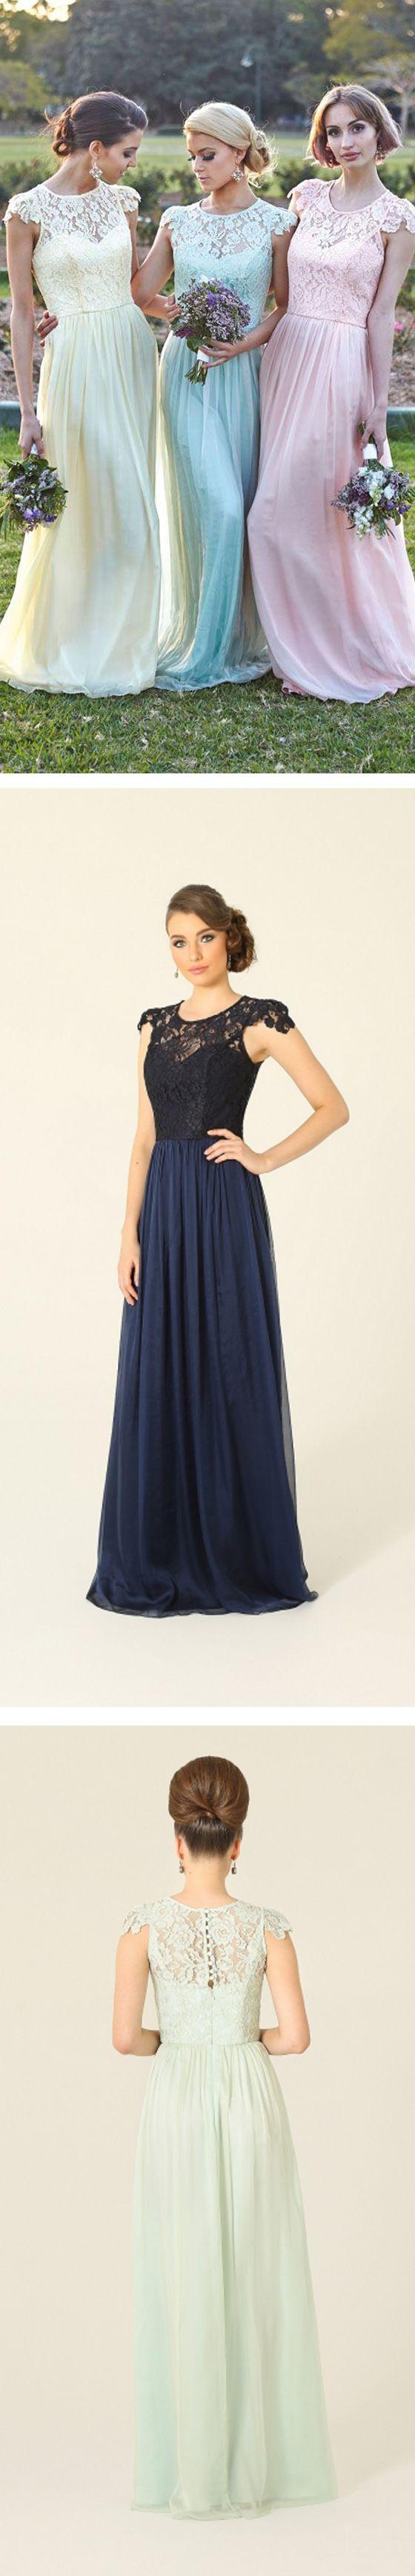 Bridesmaid dresses,long bridesmaid dresses,lace bridesmaid dresses,high quality…